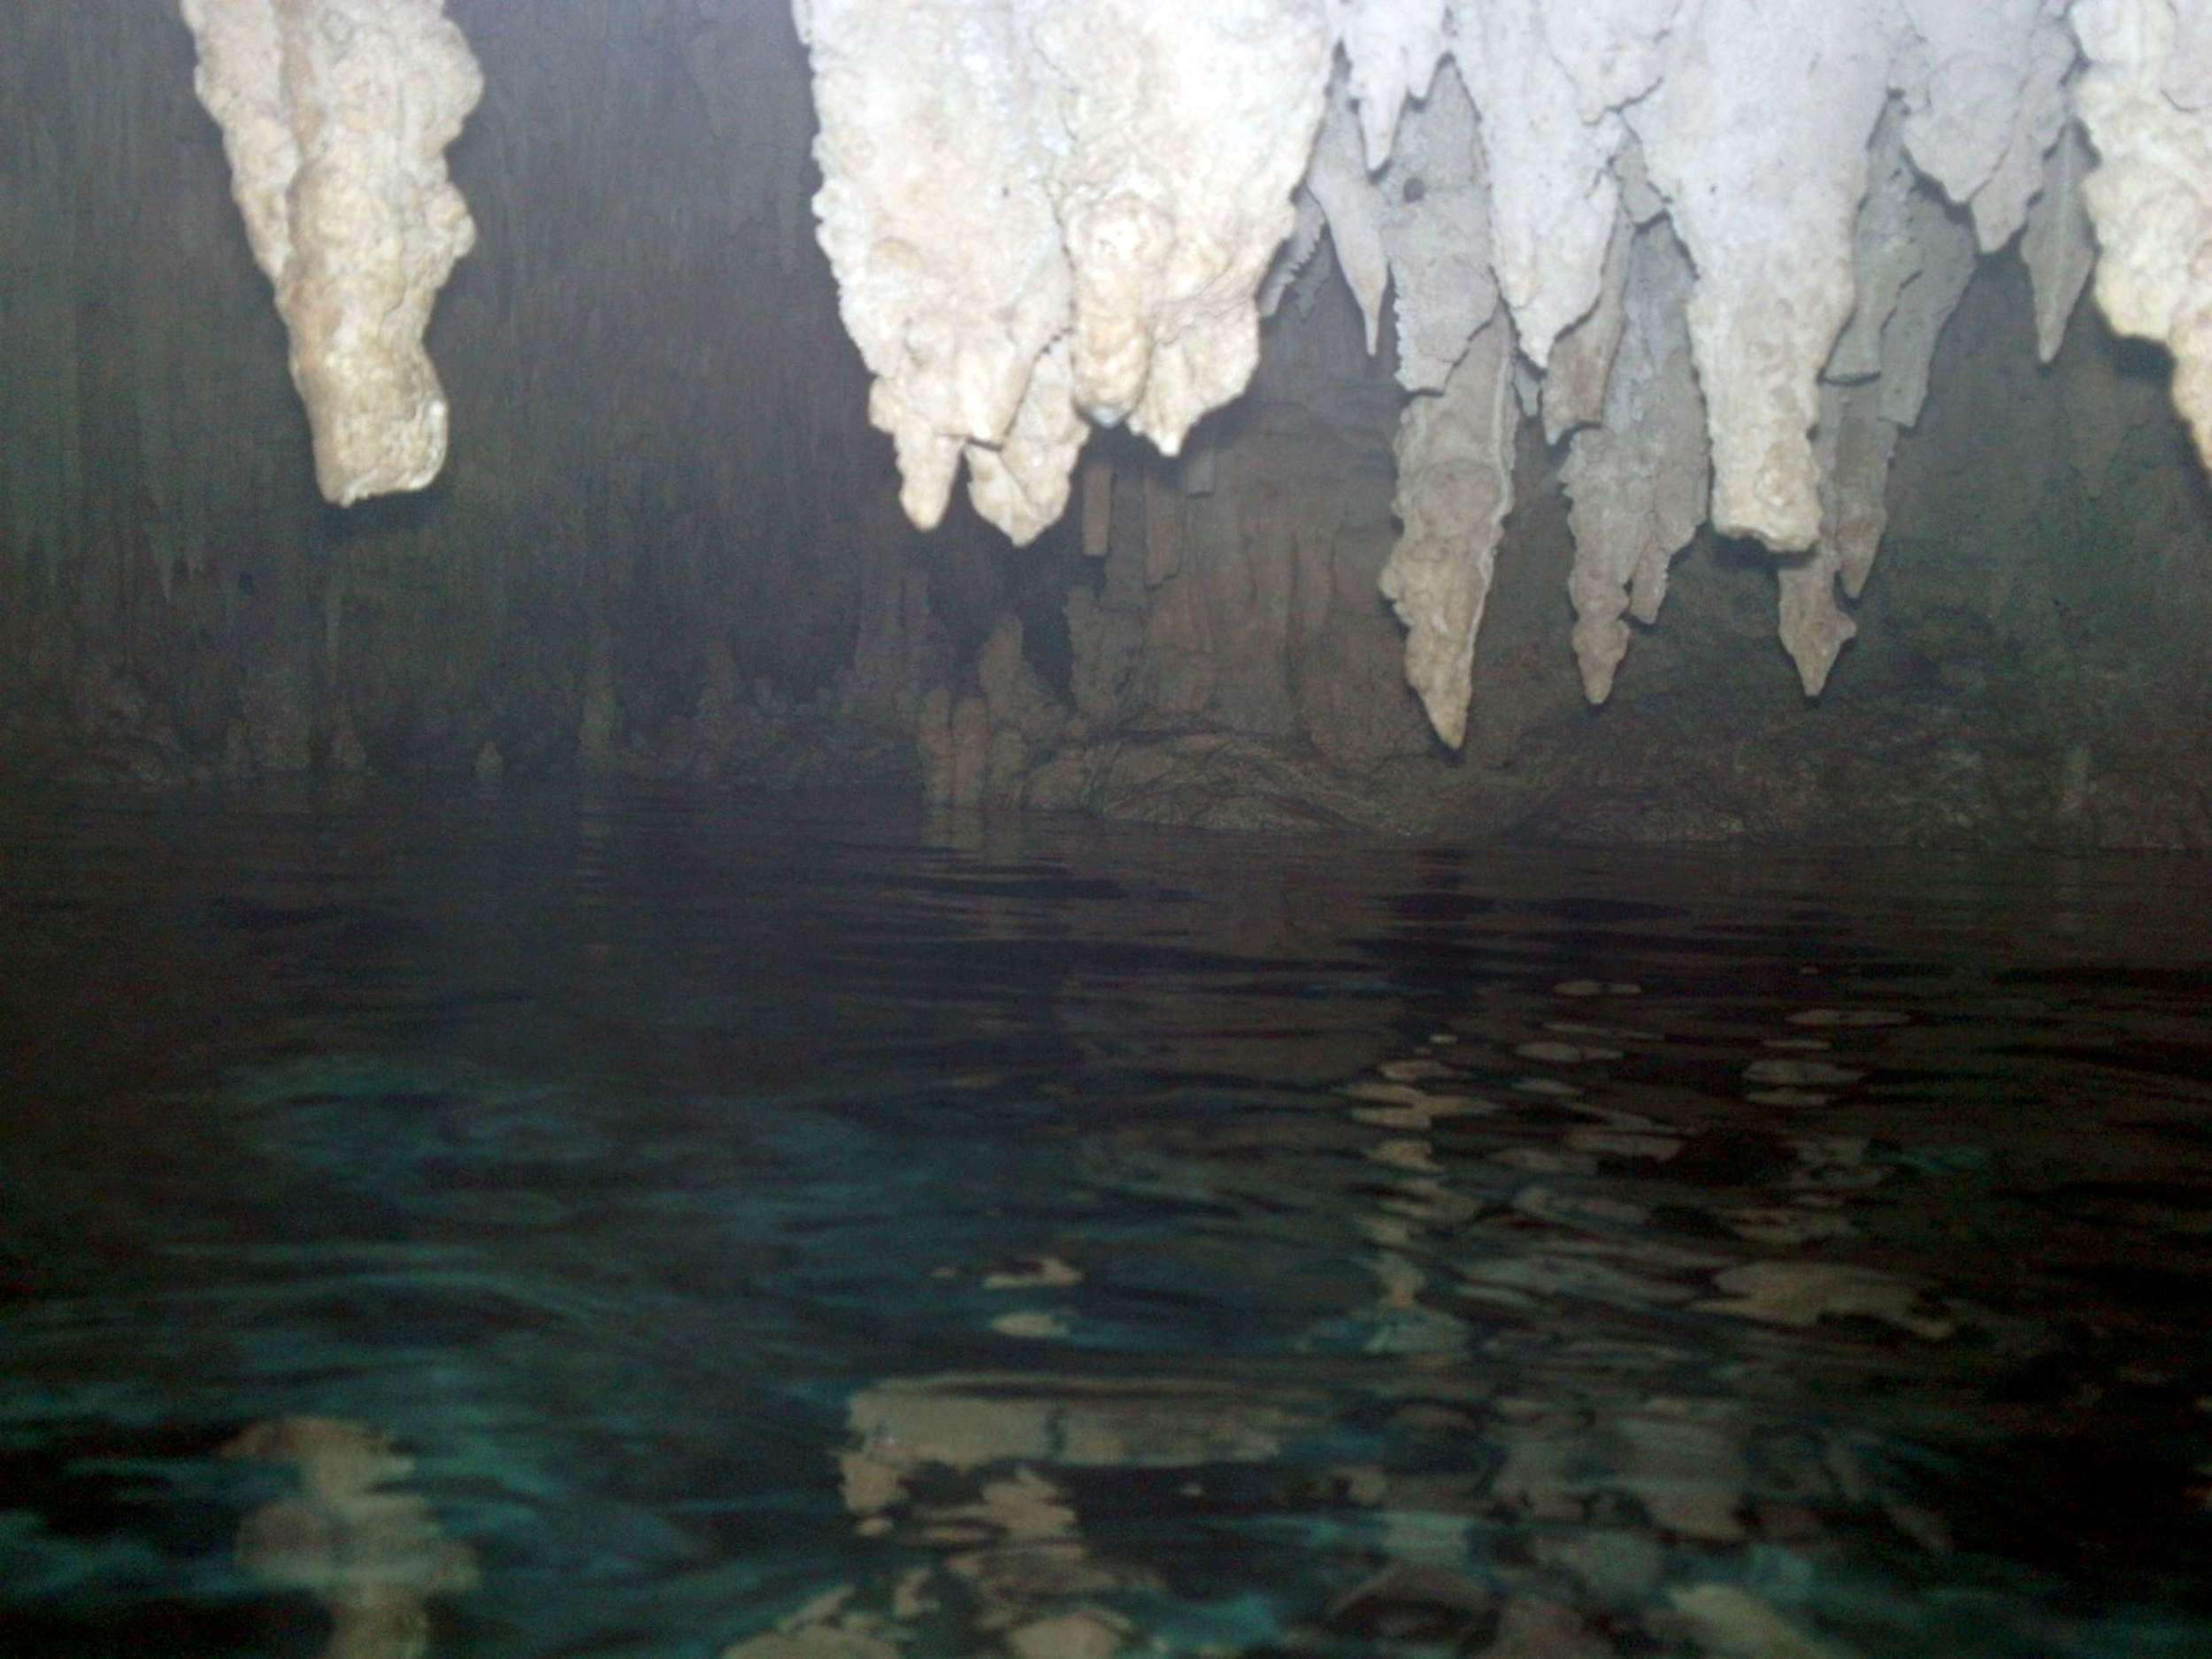 snorkeling in Chaak Tun cenote